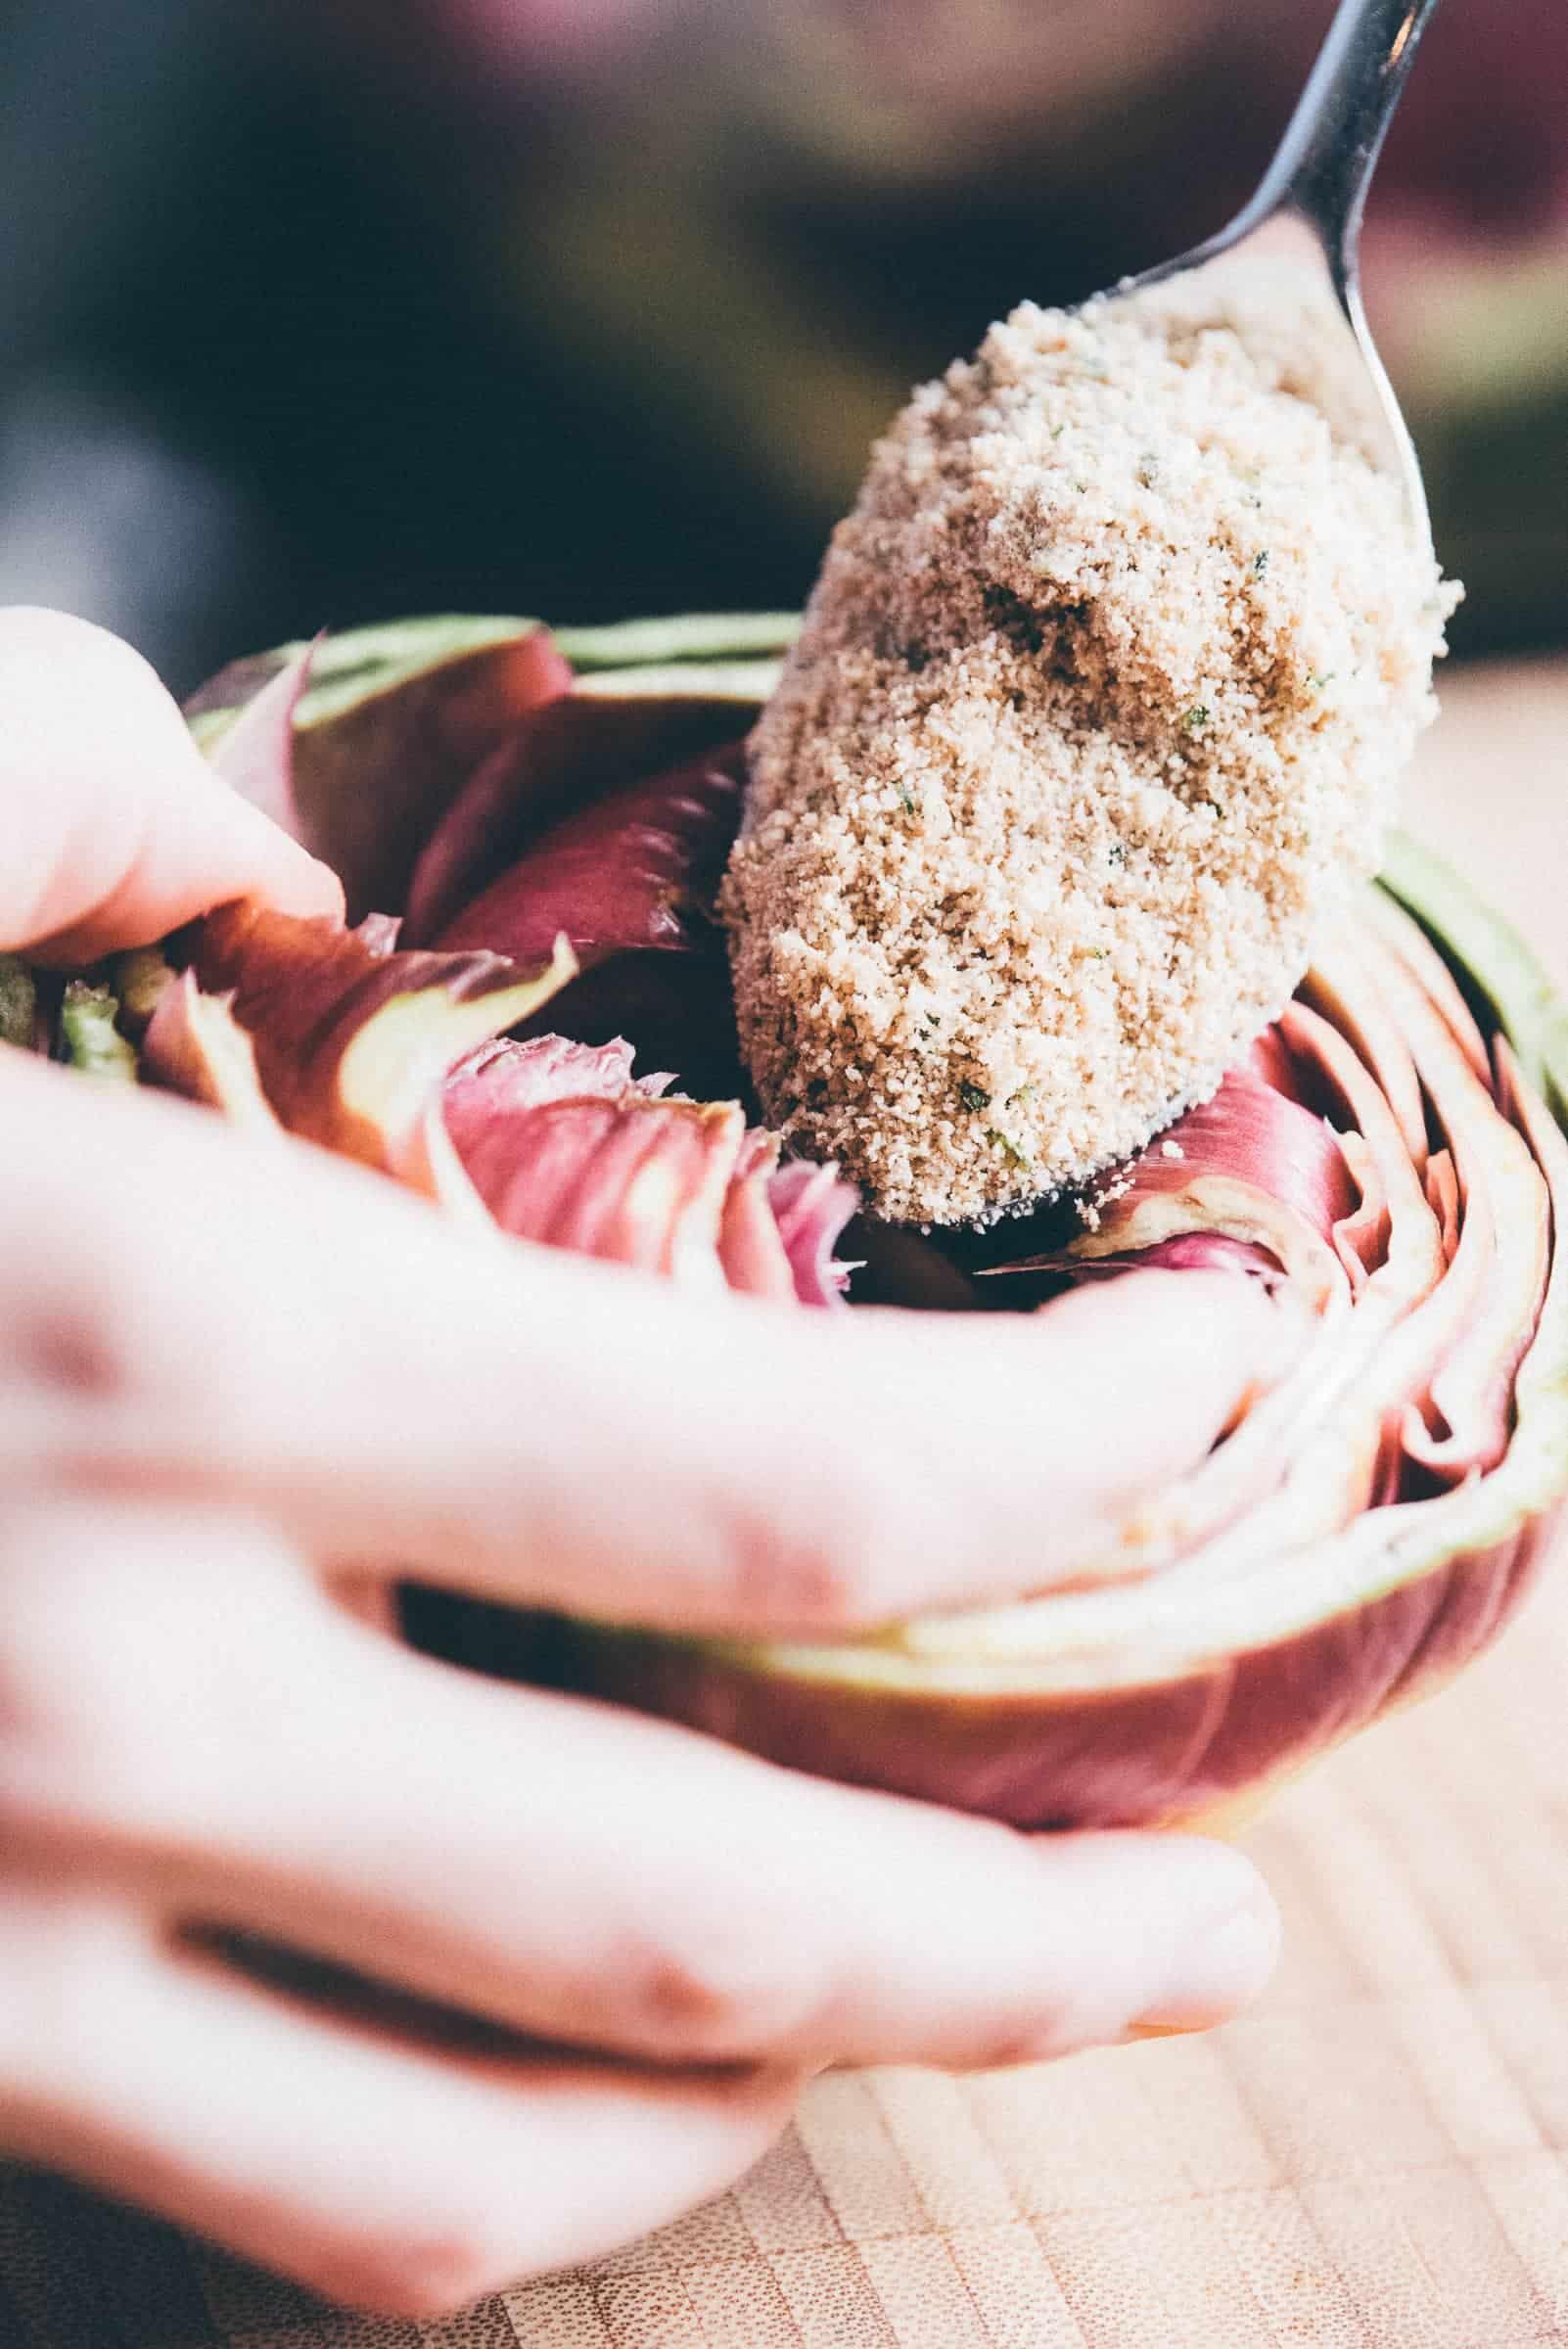 Carciofi in padella ricetta prep.19 GnamAm